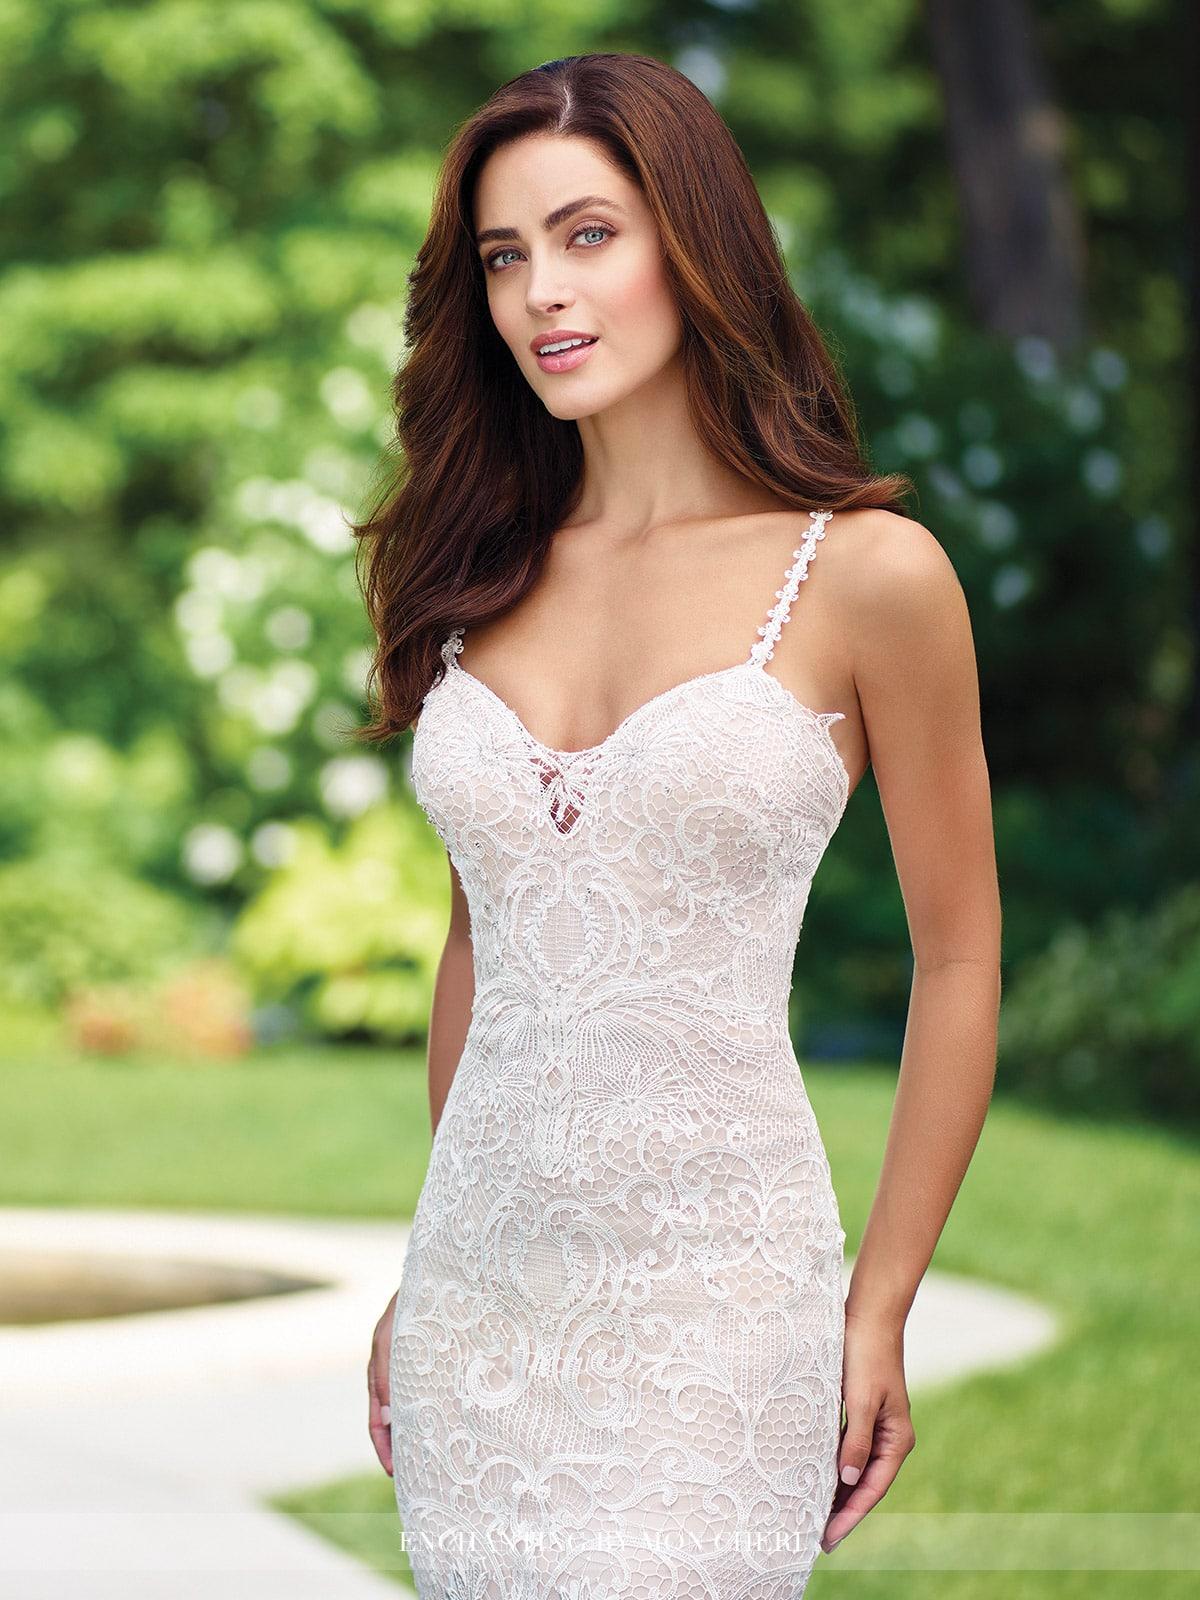 117179_crop-Wedding-Dresses-2017